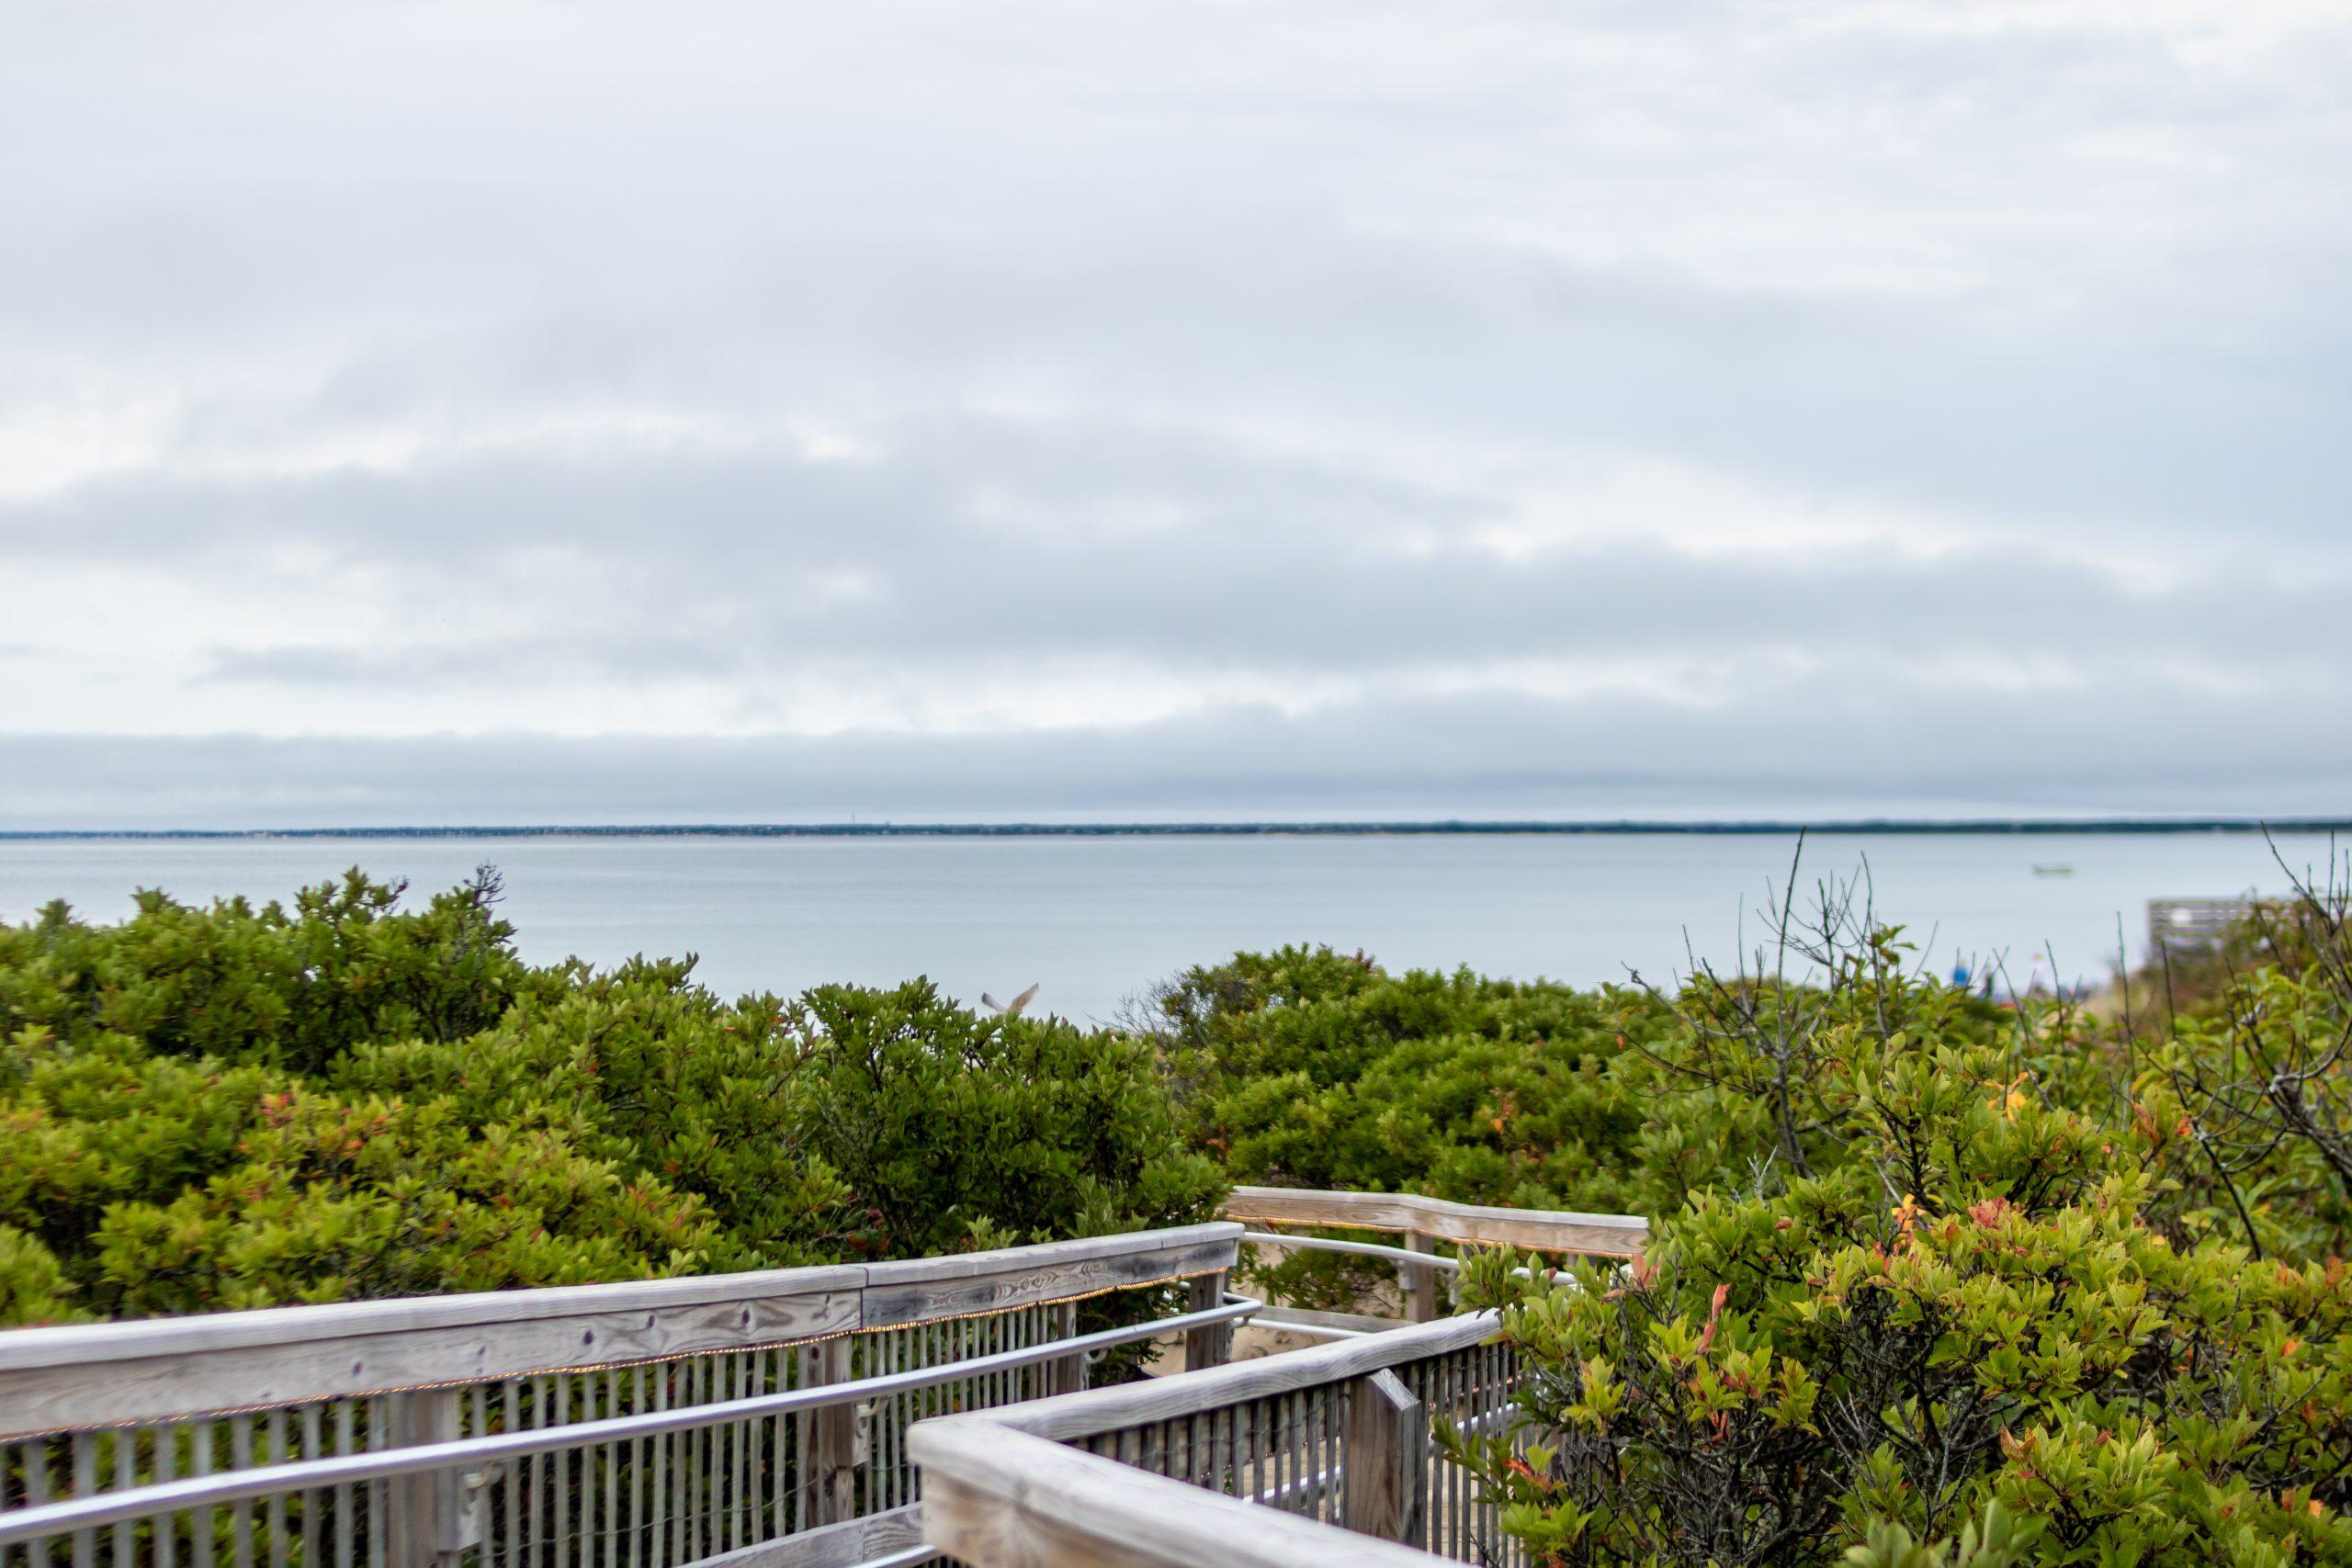 Ocean Edge Resort boardwalk to the beach